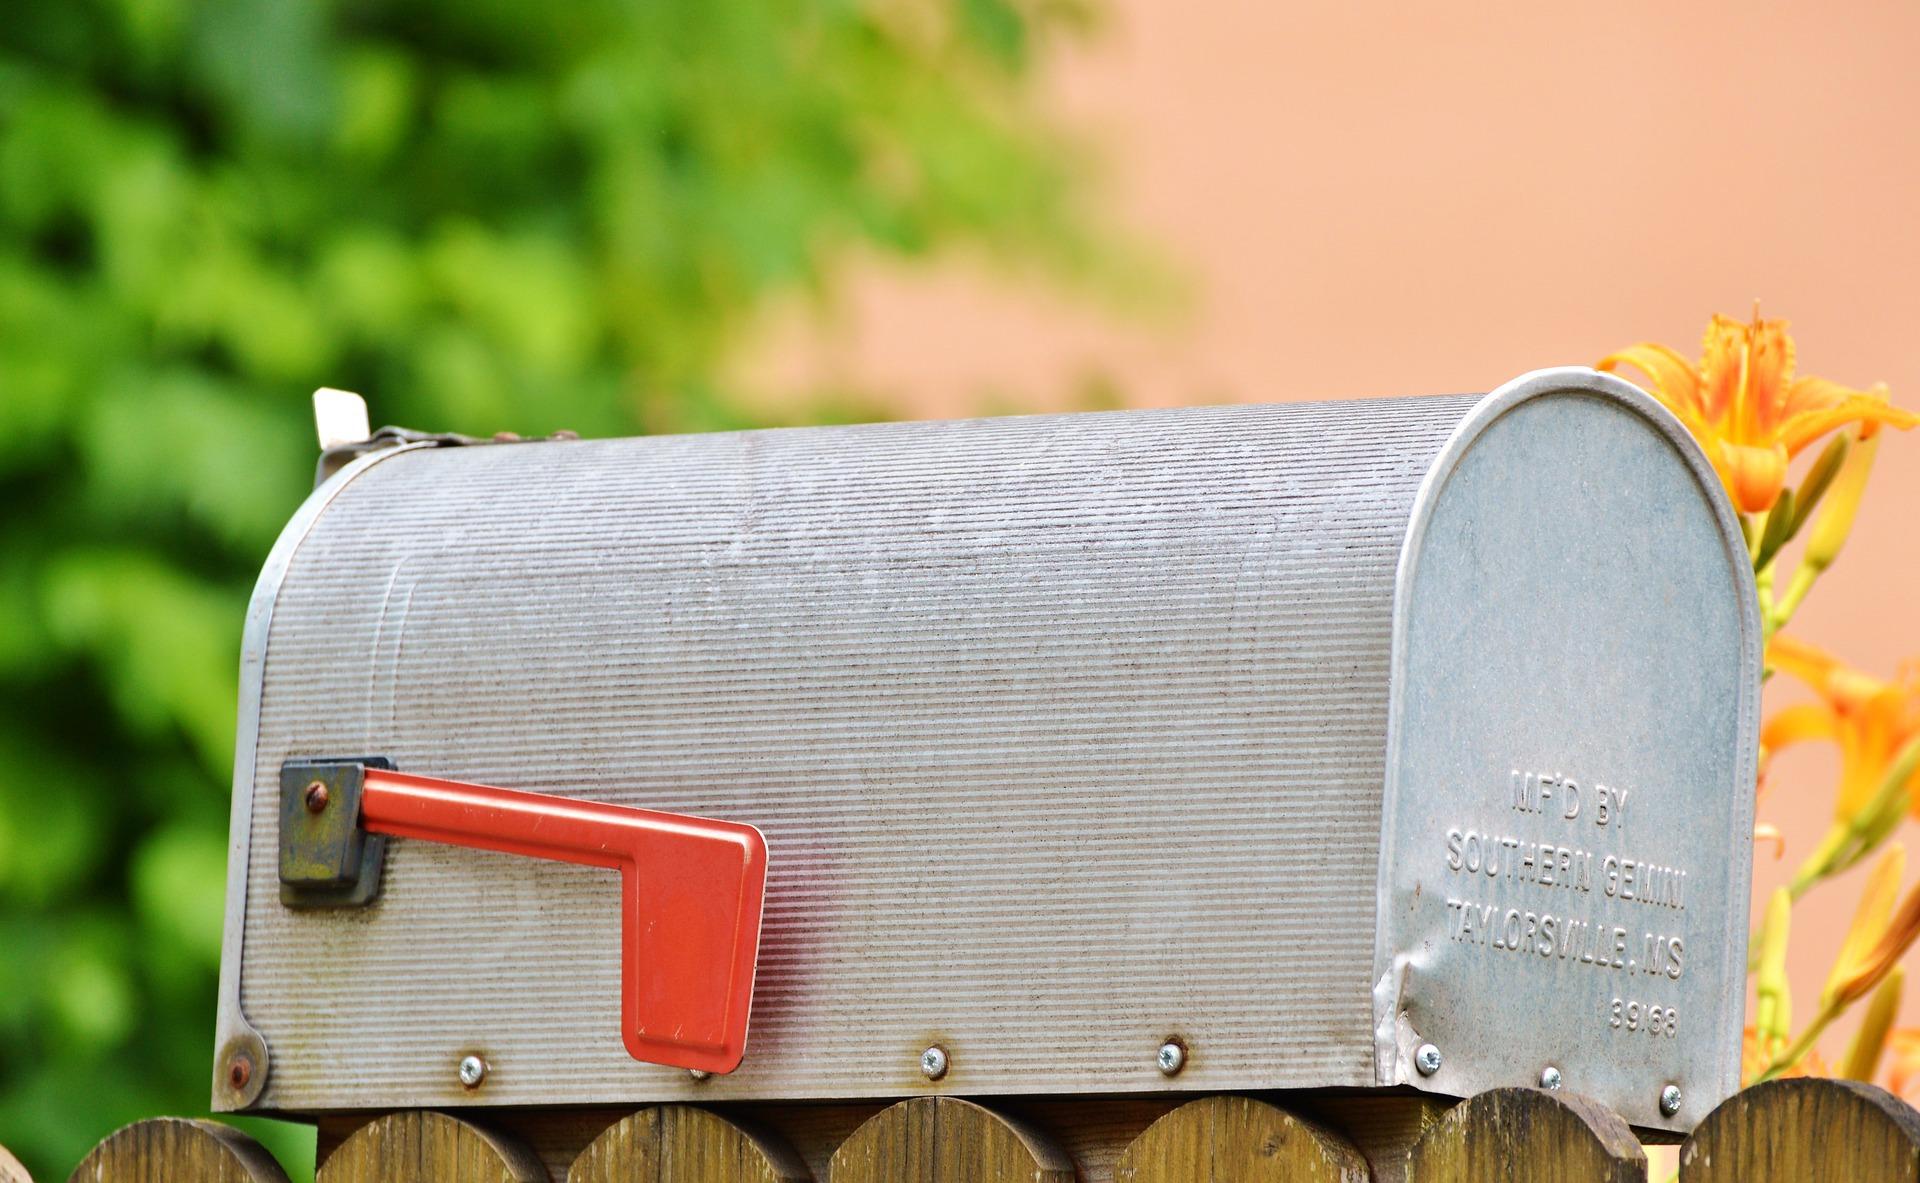 Boite aux lettres ©Capri23auto CC0 Pixabay